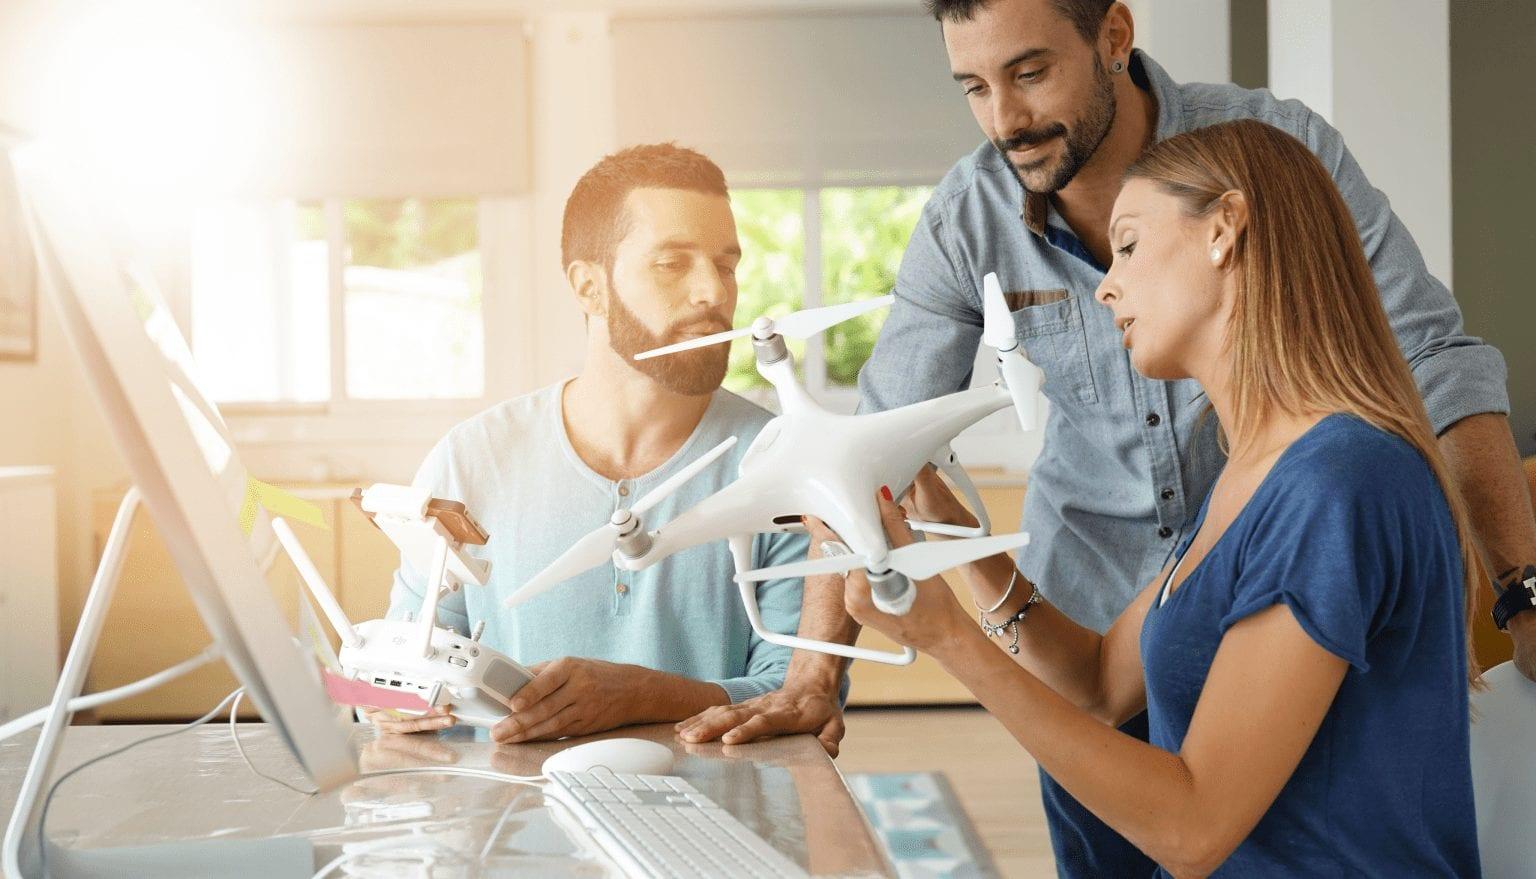 Drones in Insurance Industry 2020